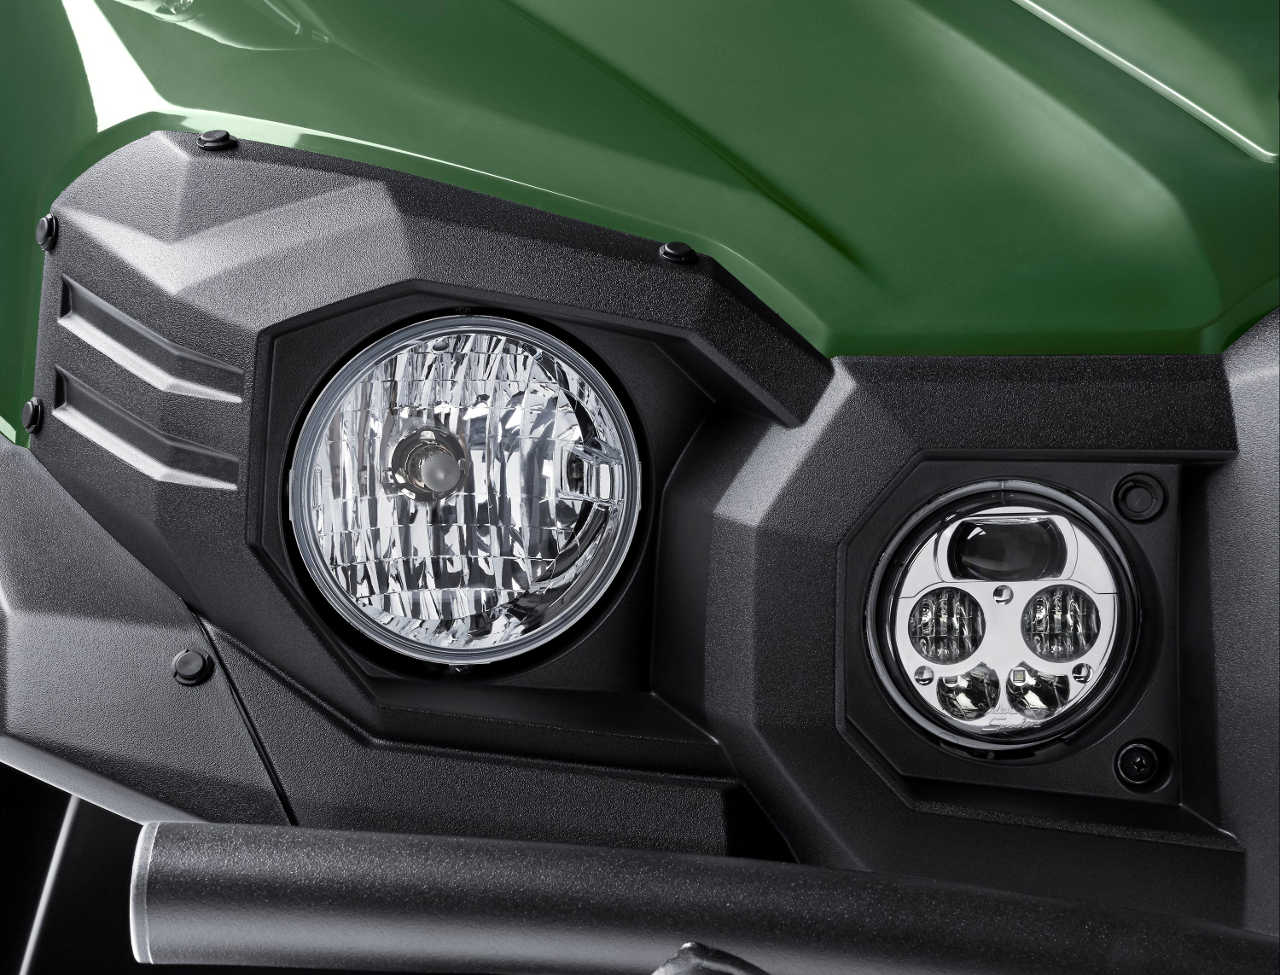 2016 Kawasaki Mule Pro Fx Atv Illustrated